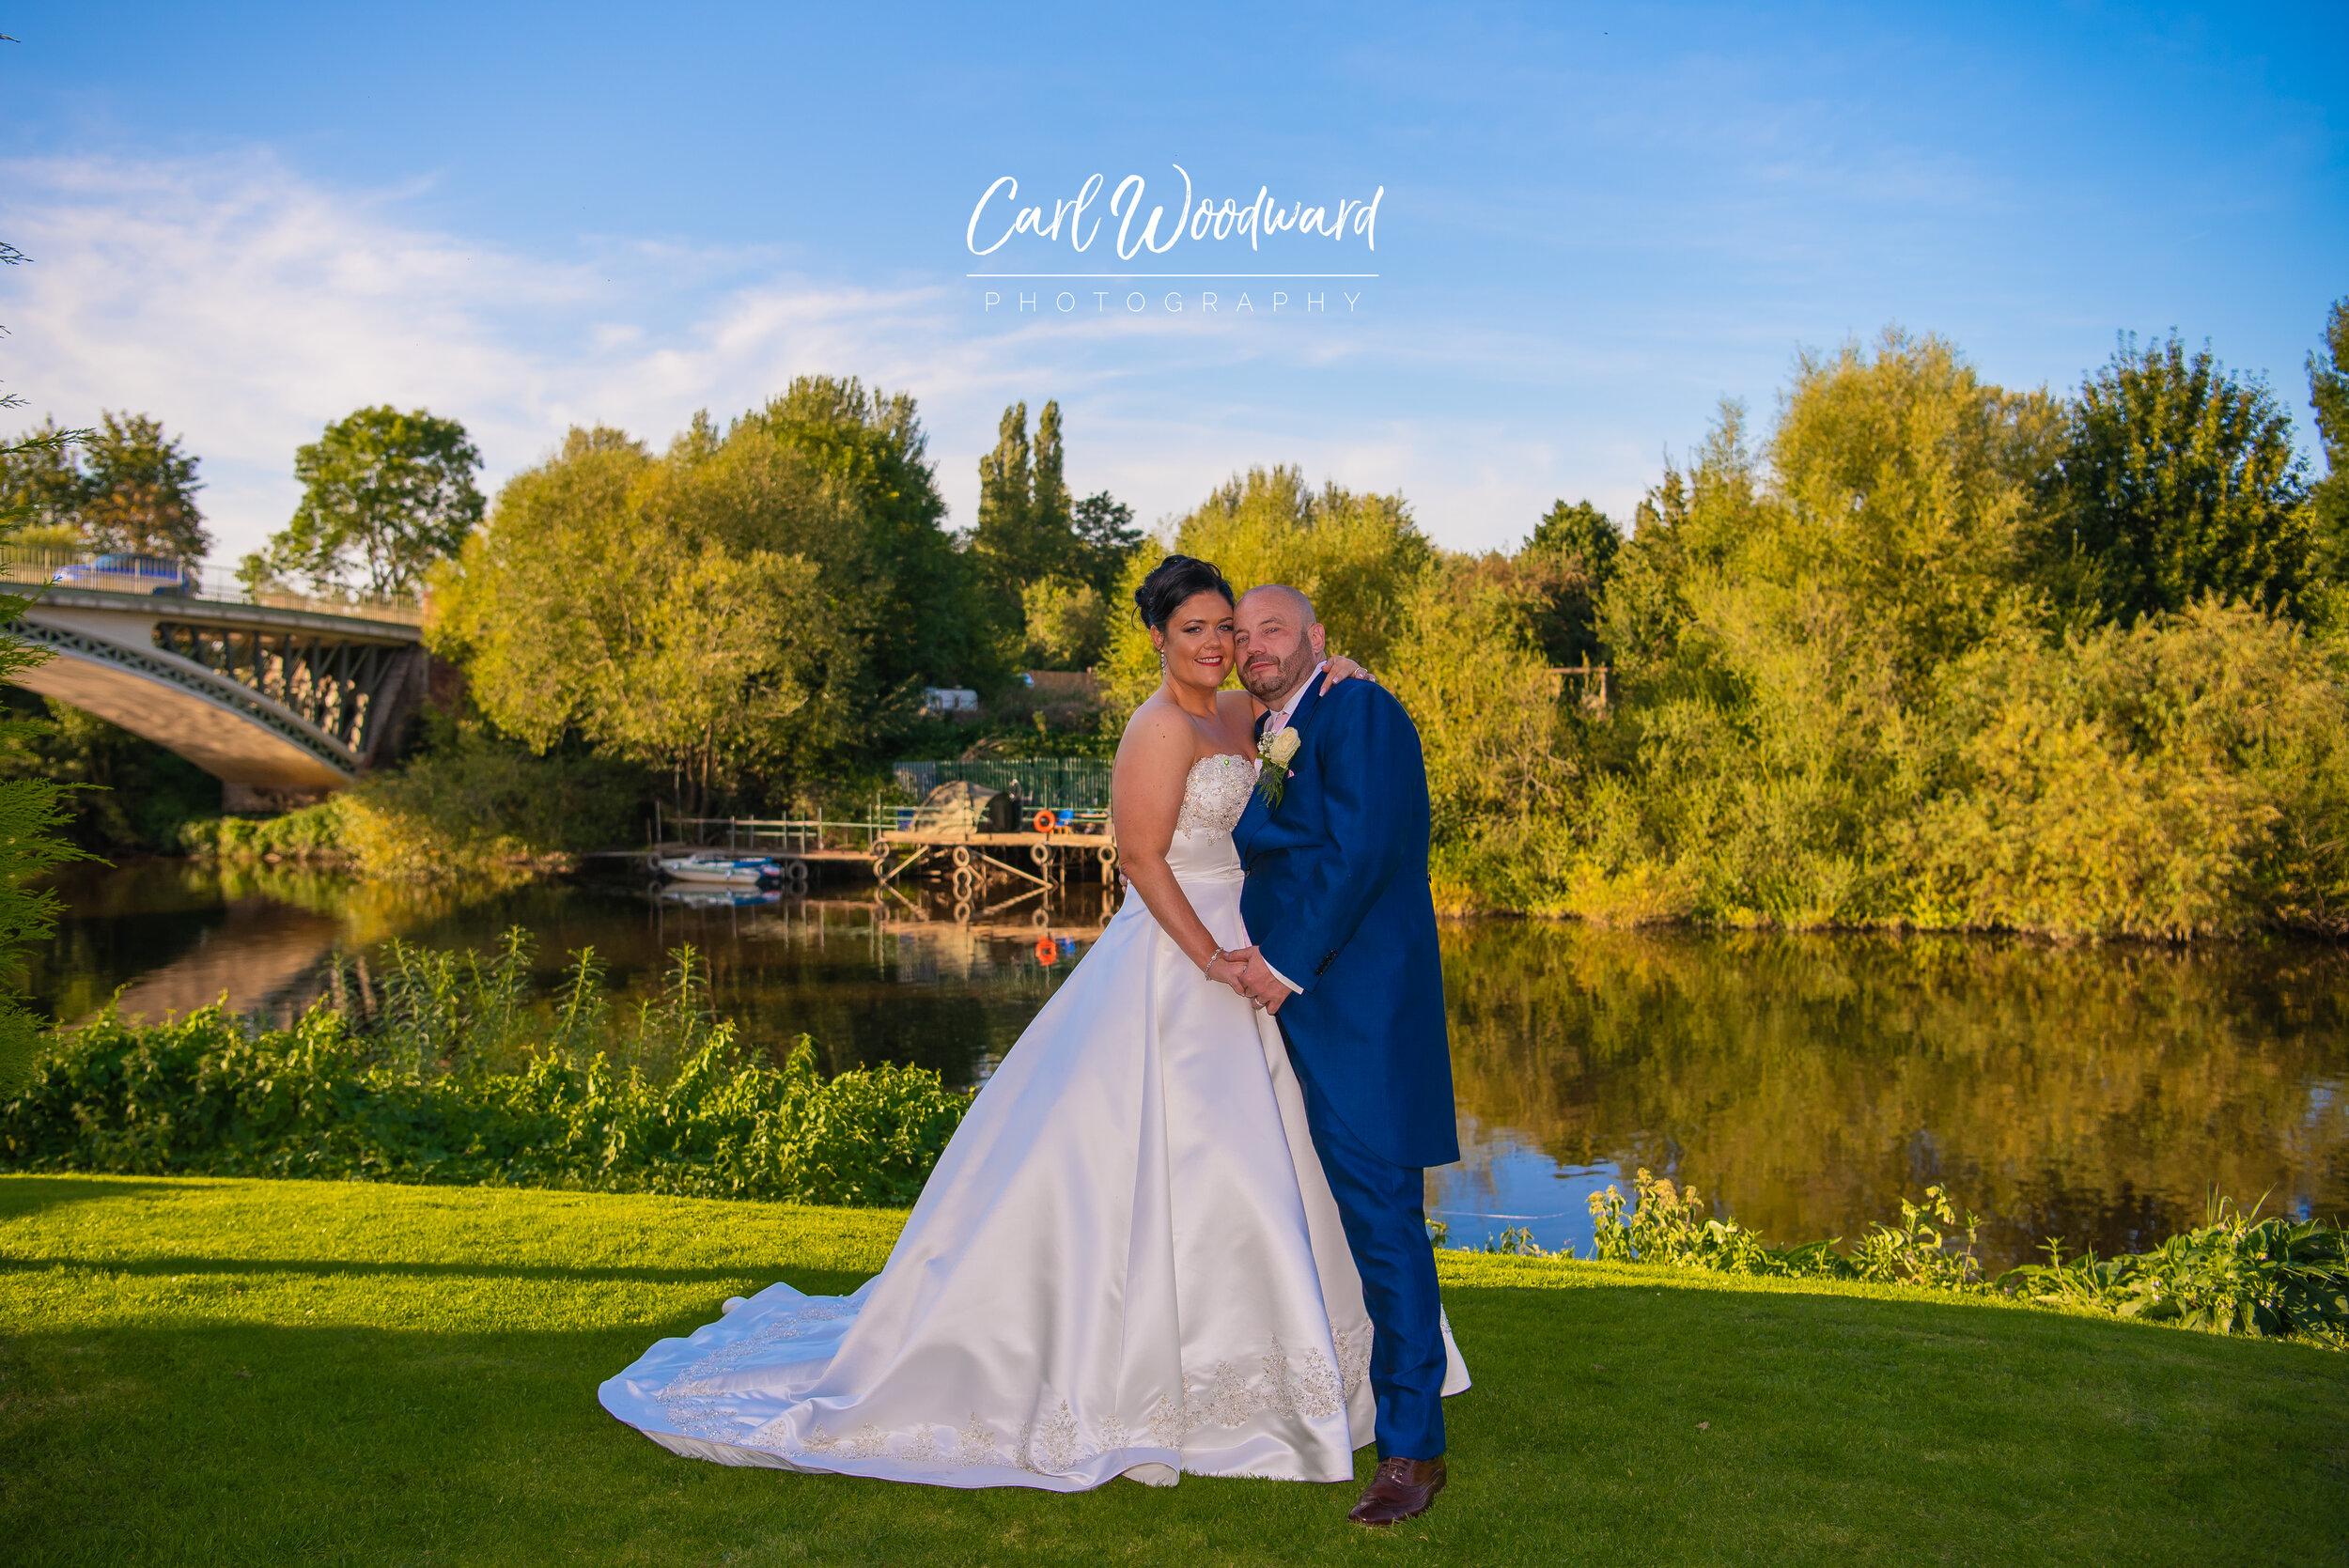 012-The-Holt-Fleet-Wedding-Cardiff-Wedding-Photographer.jpg